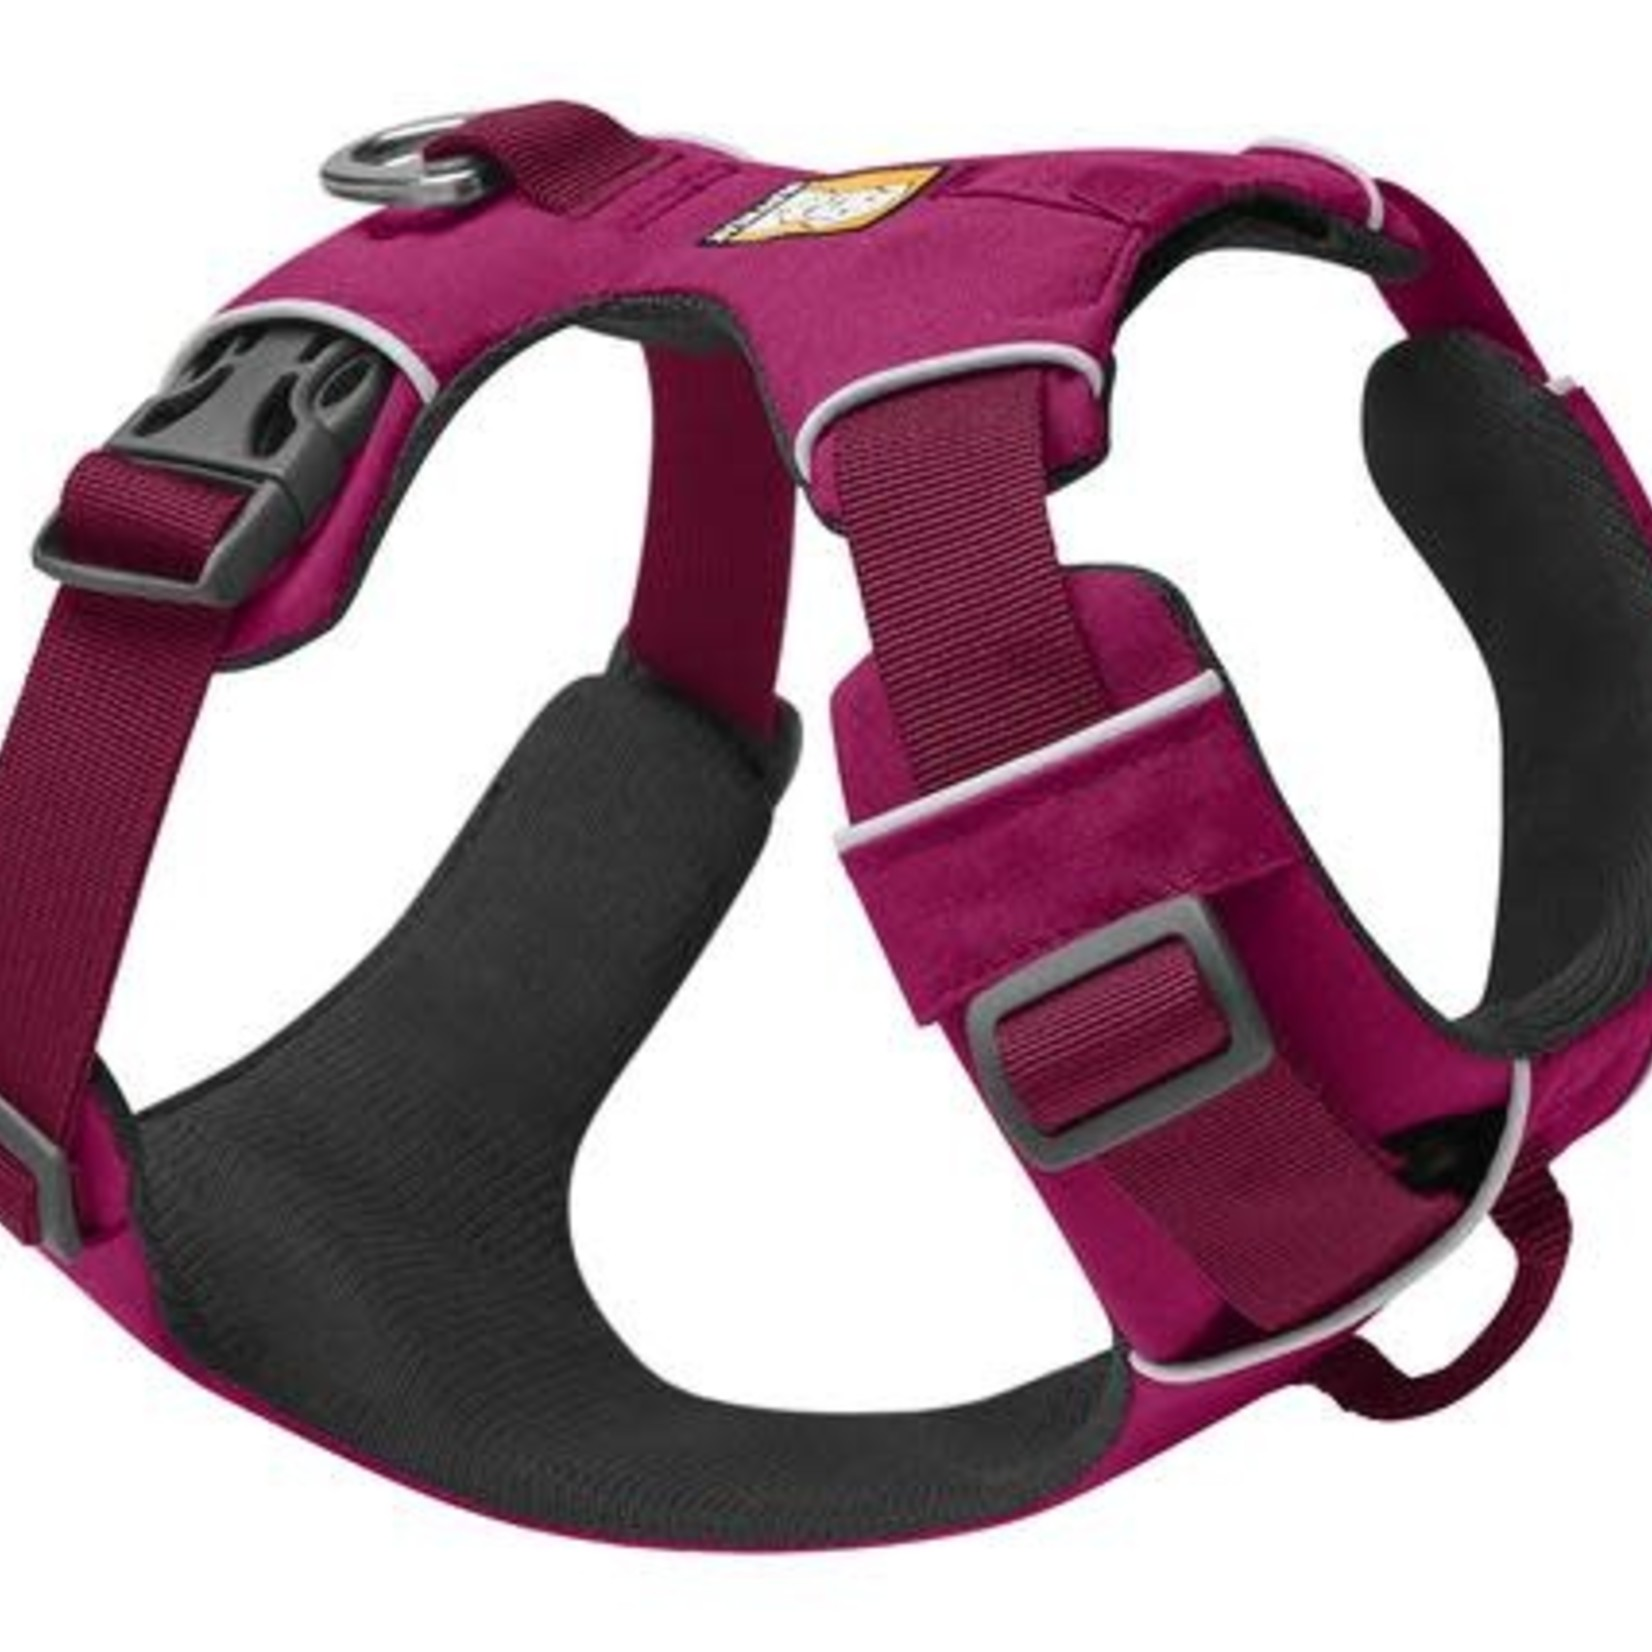 Ruff Wear Ruffwear Front Range Harness Hibiscus Pink XX-Small